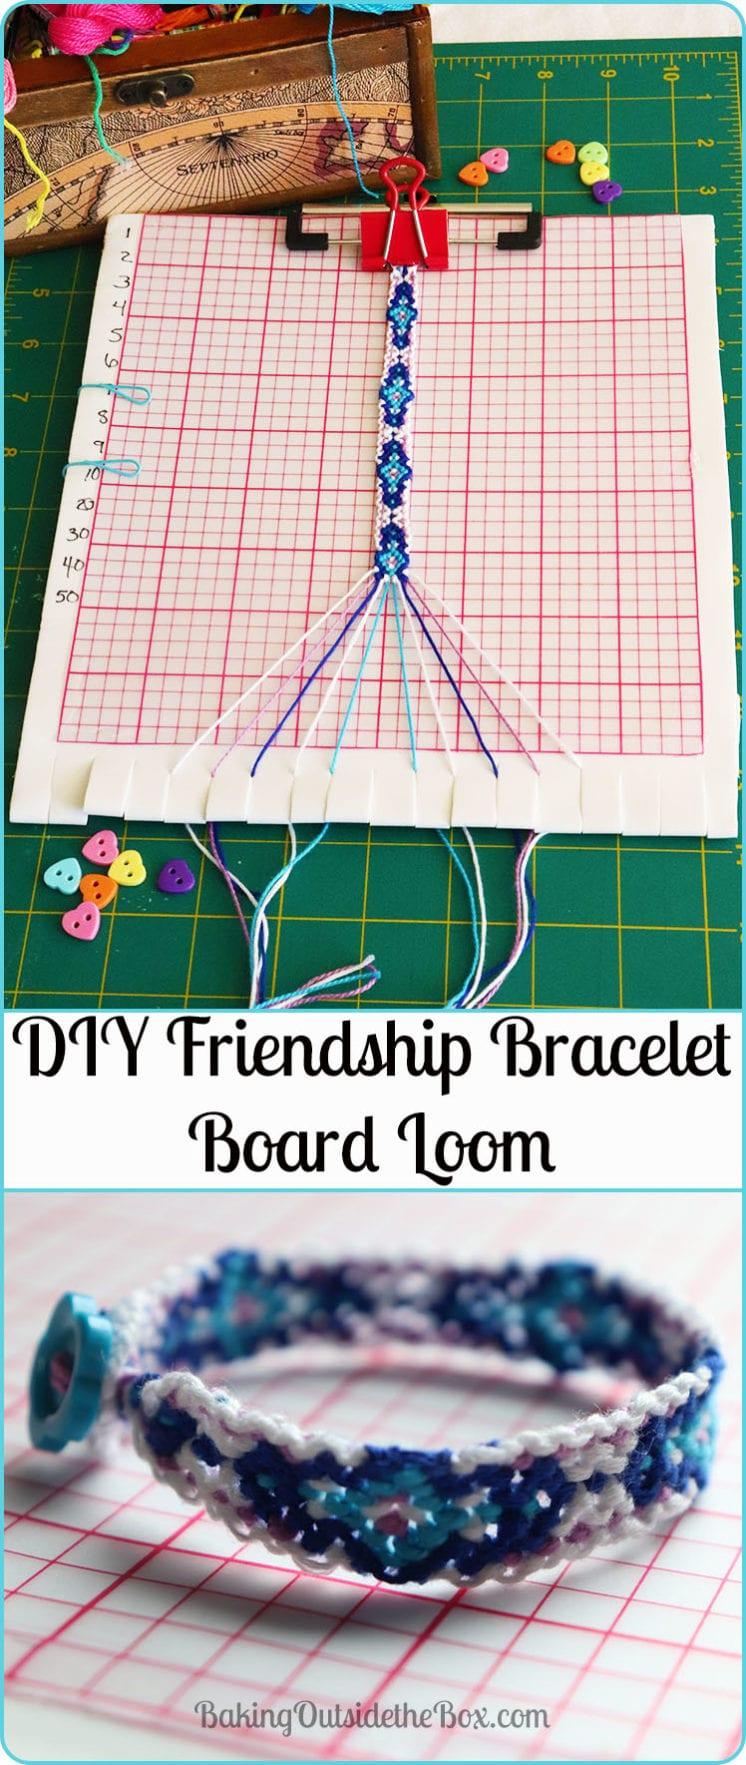 Diy Friendship Bracelet Board Loom Creating Baking Outside The Box